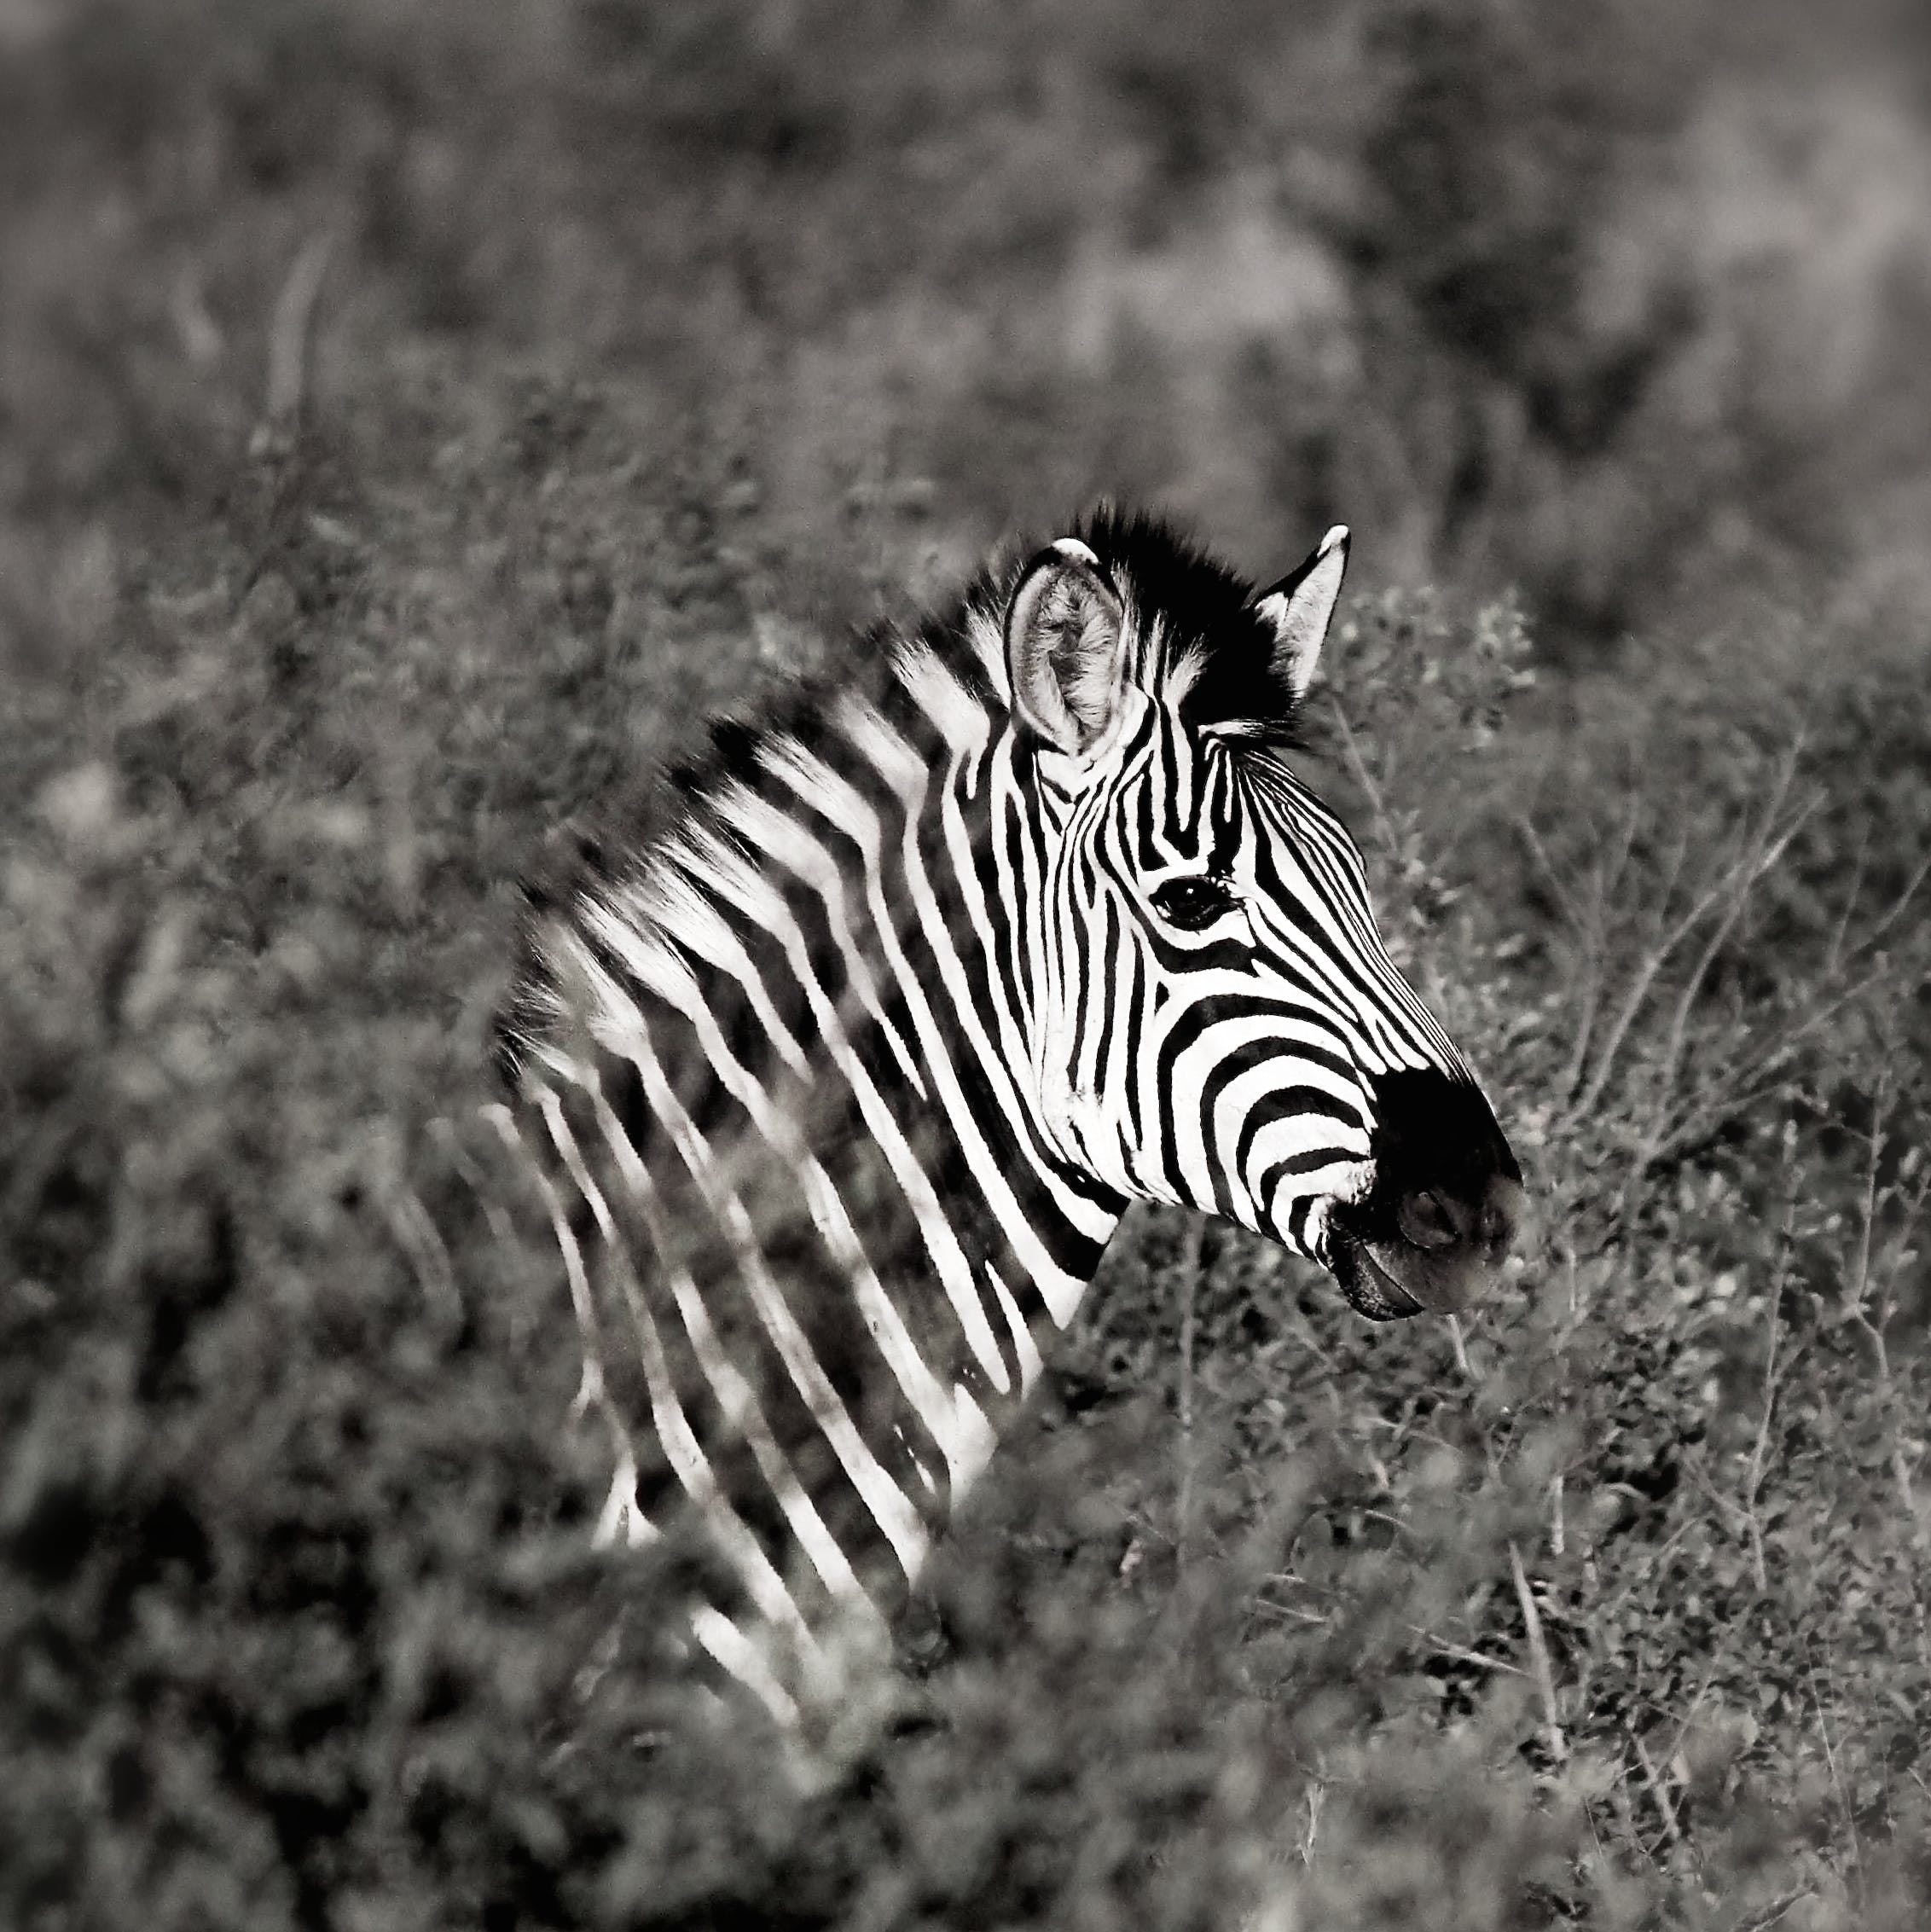 Monochrome Photography of Zebra